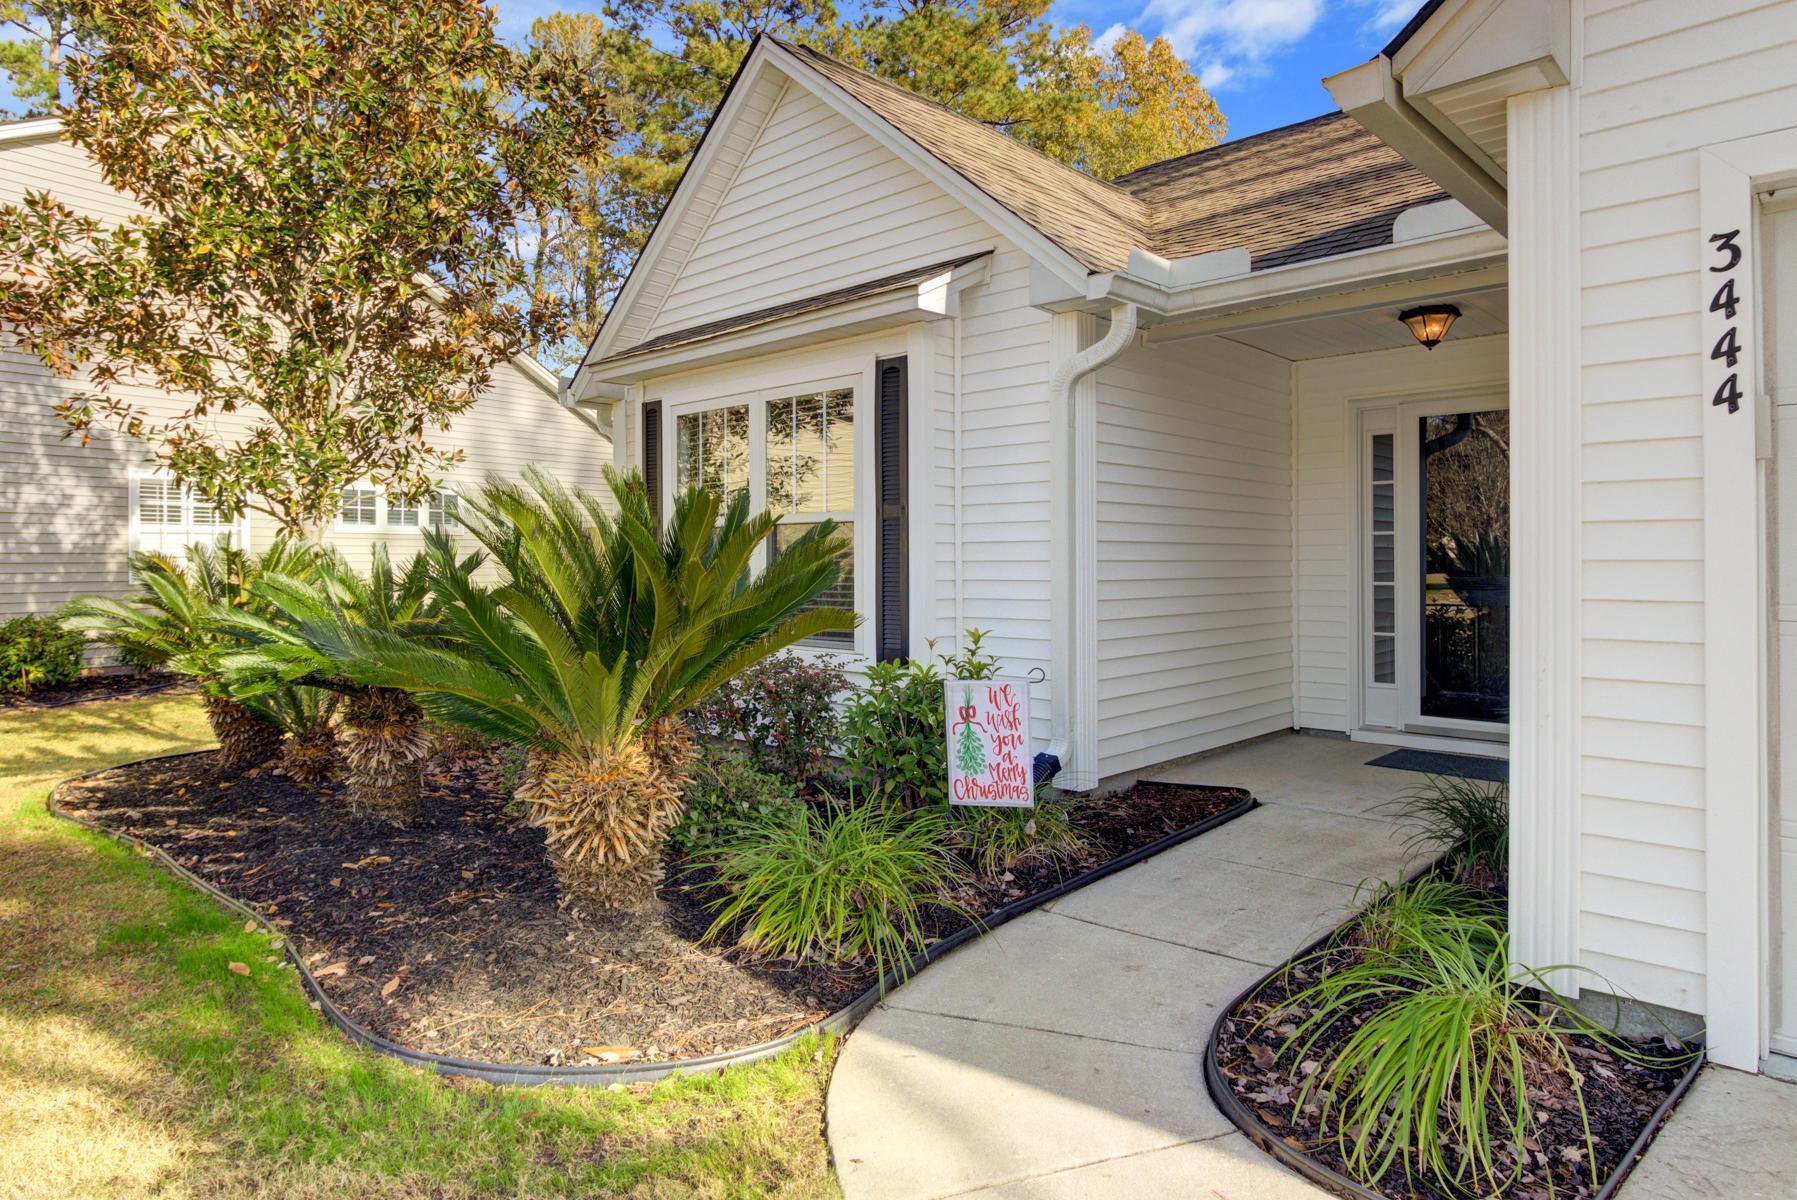 Park West Homes For Sale - 3444 Wellesley, Mount Pleasant, SC - 27